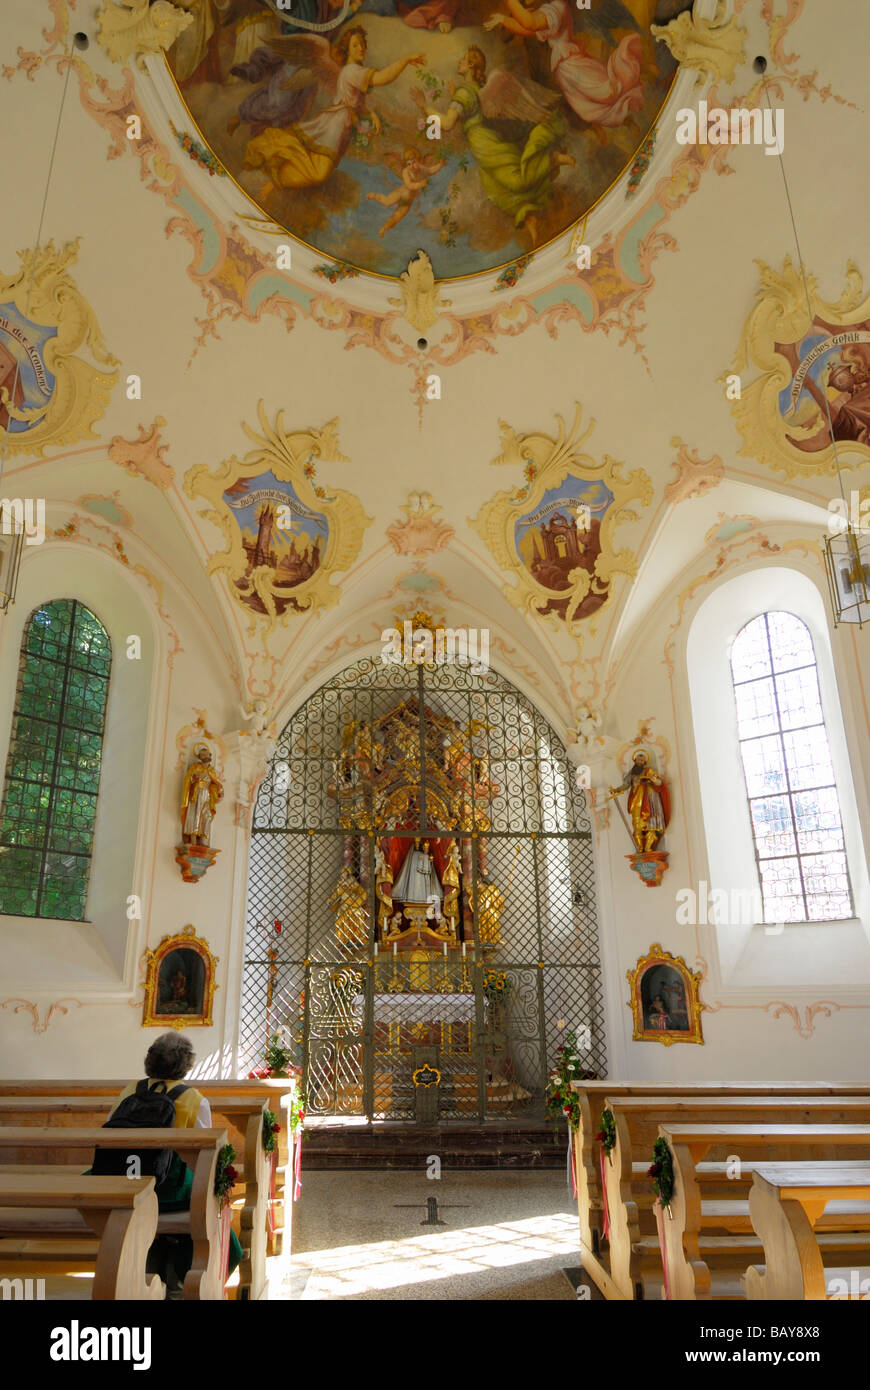 chapell Lorettokapelle, pilgrimage chapell, interior view, Oberstdorf, Allgaeu range, Allgaeu, Swabia, Bavaria, - Stock Image